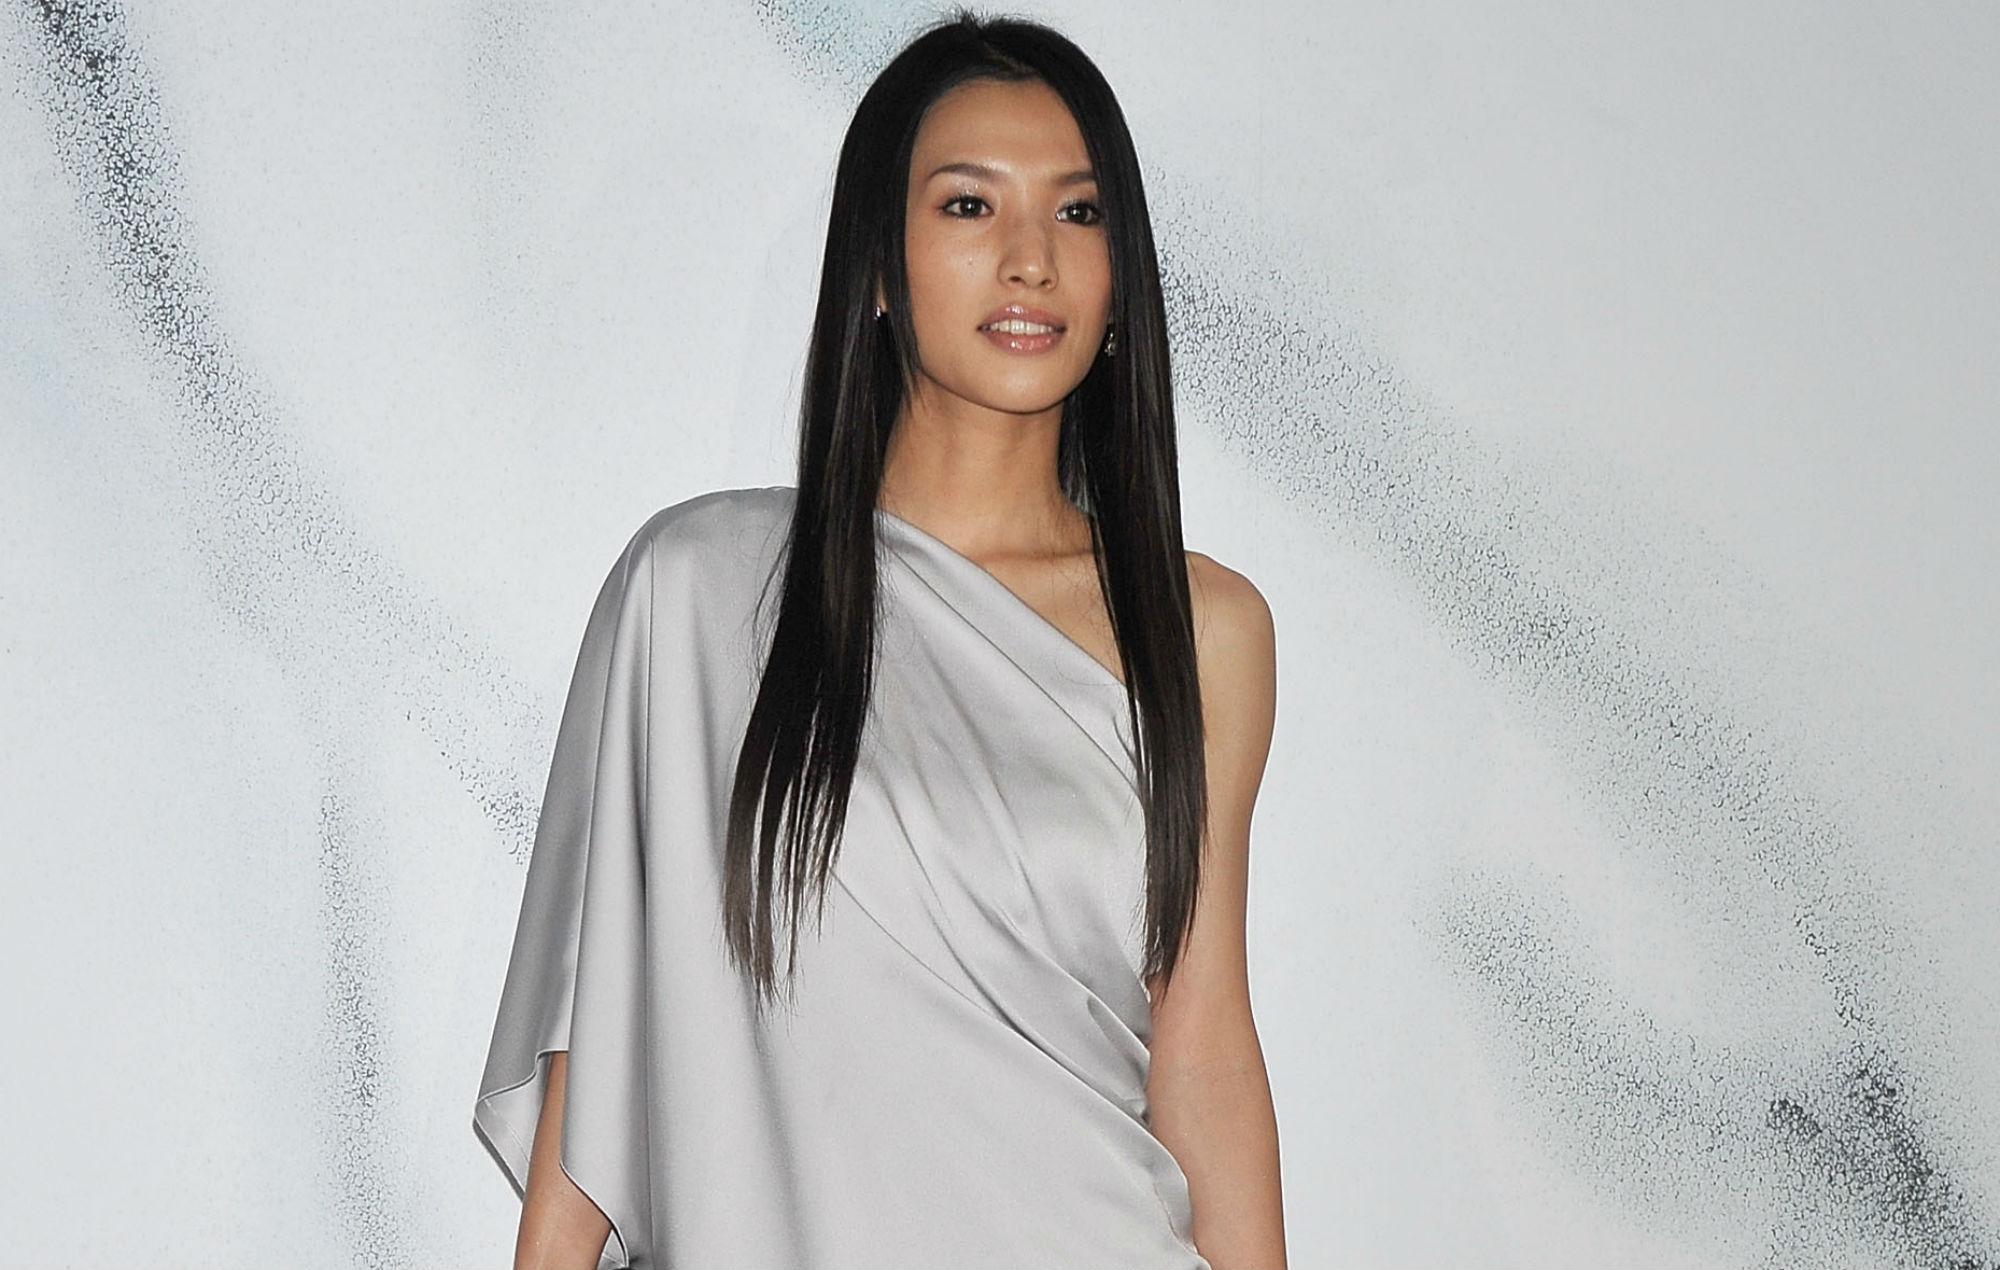 Alien Huang morto a 36 anni